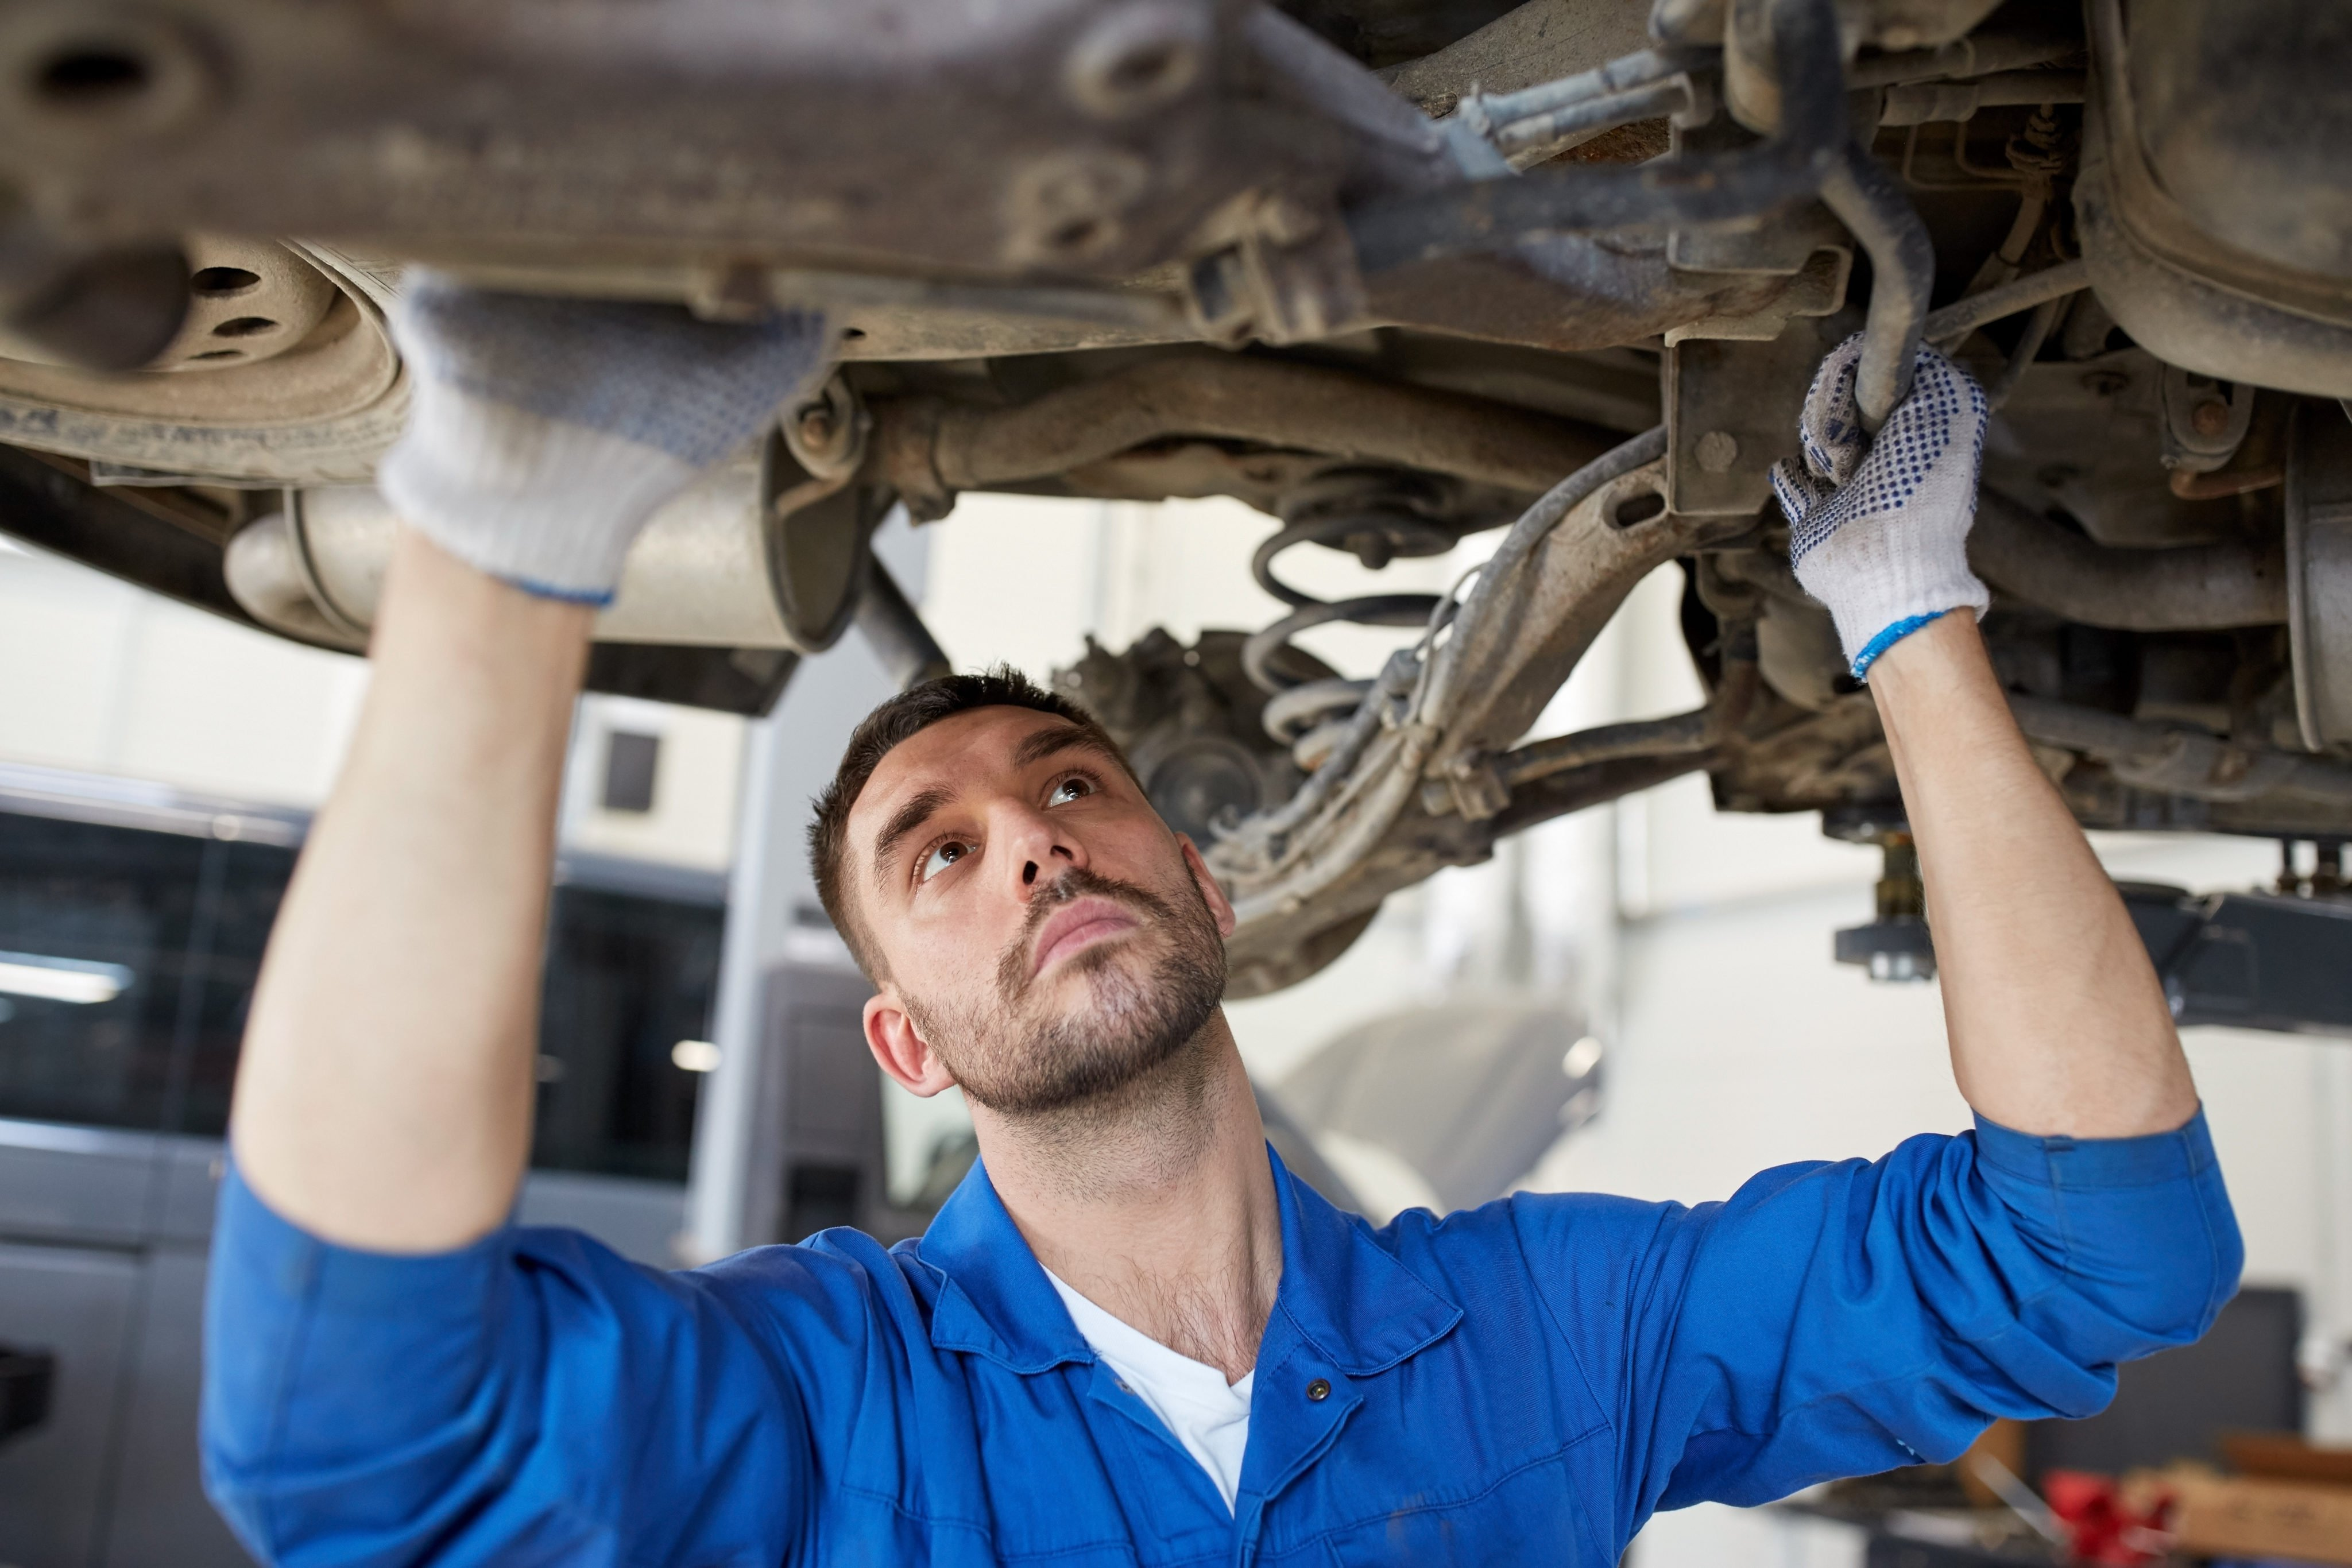 Shutterstock X on Auto Mechanic Car Repair